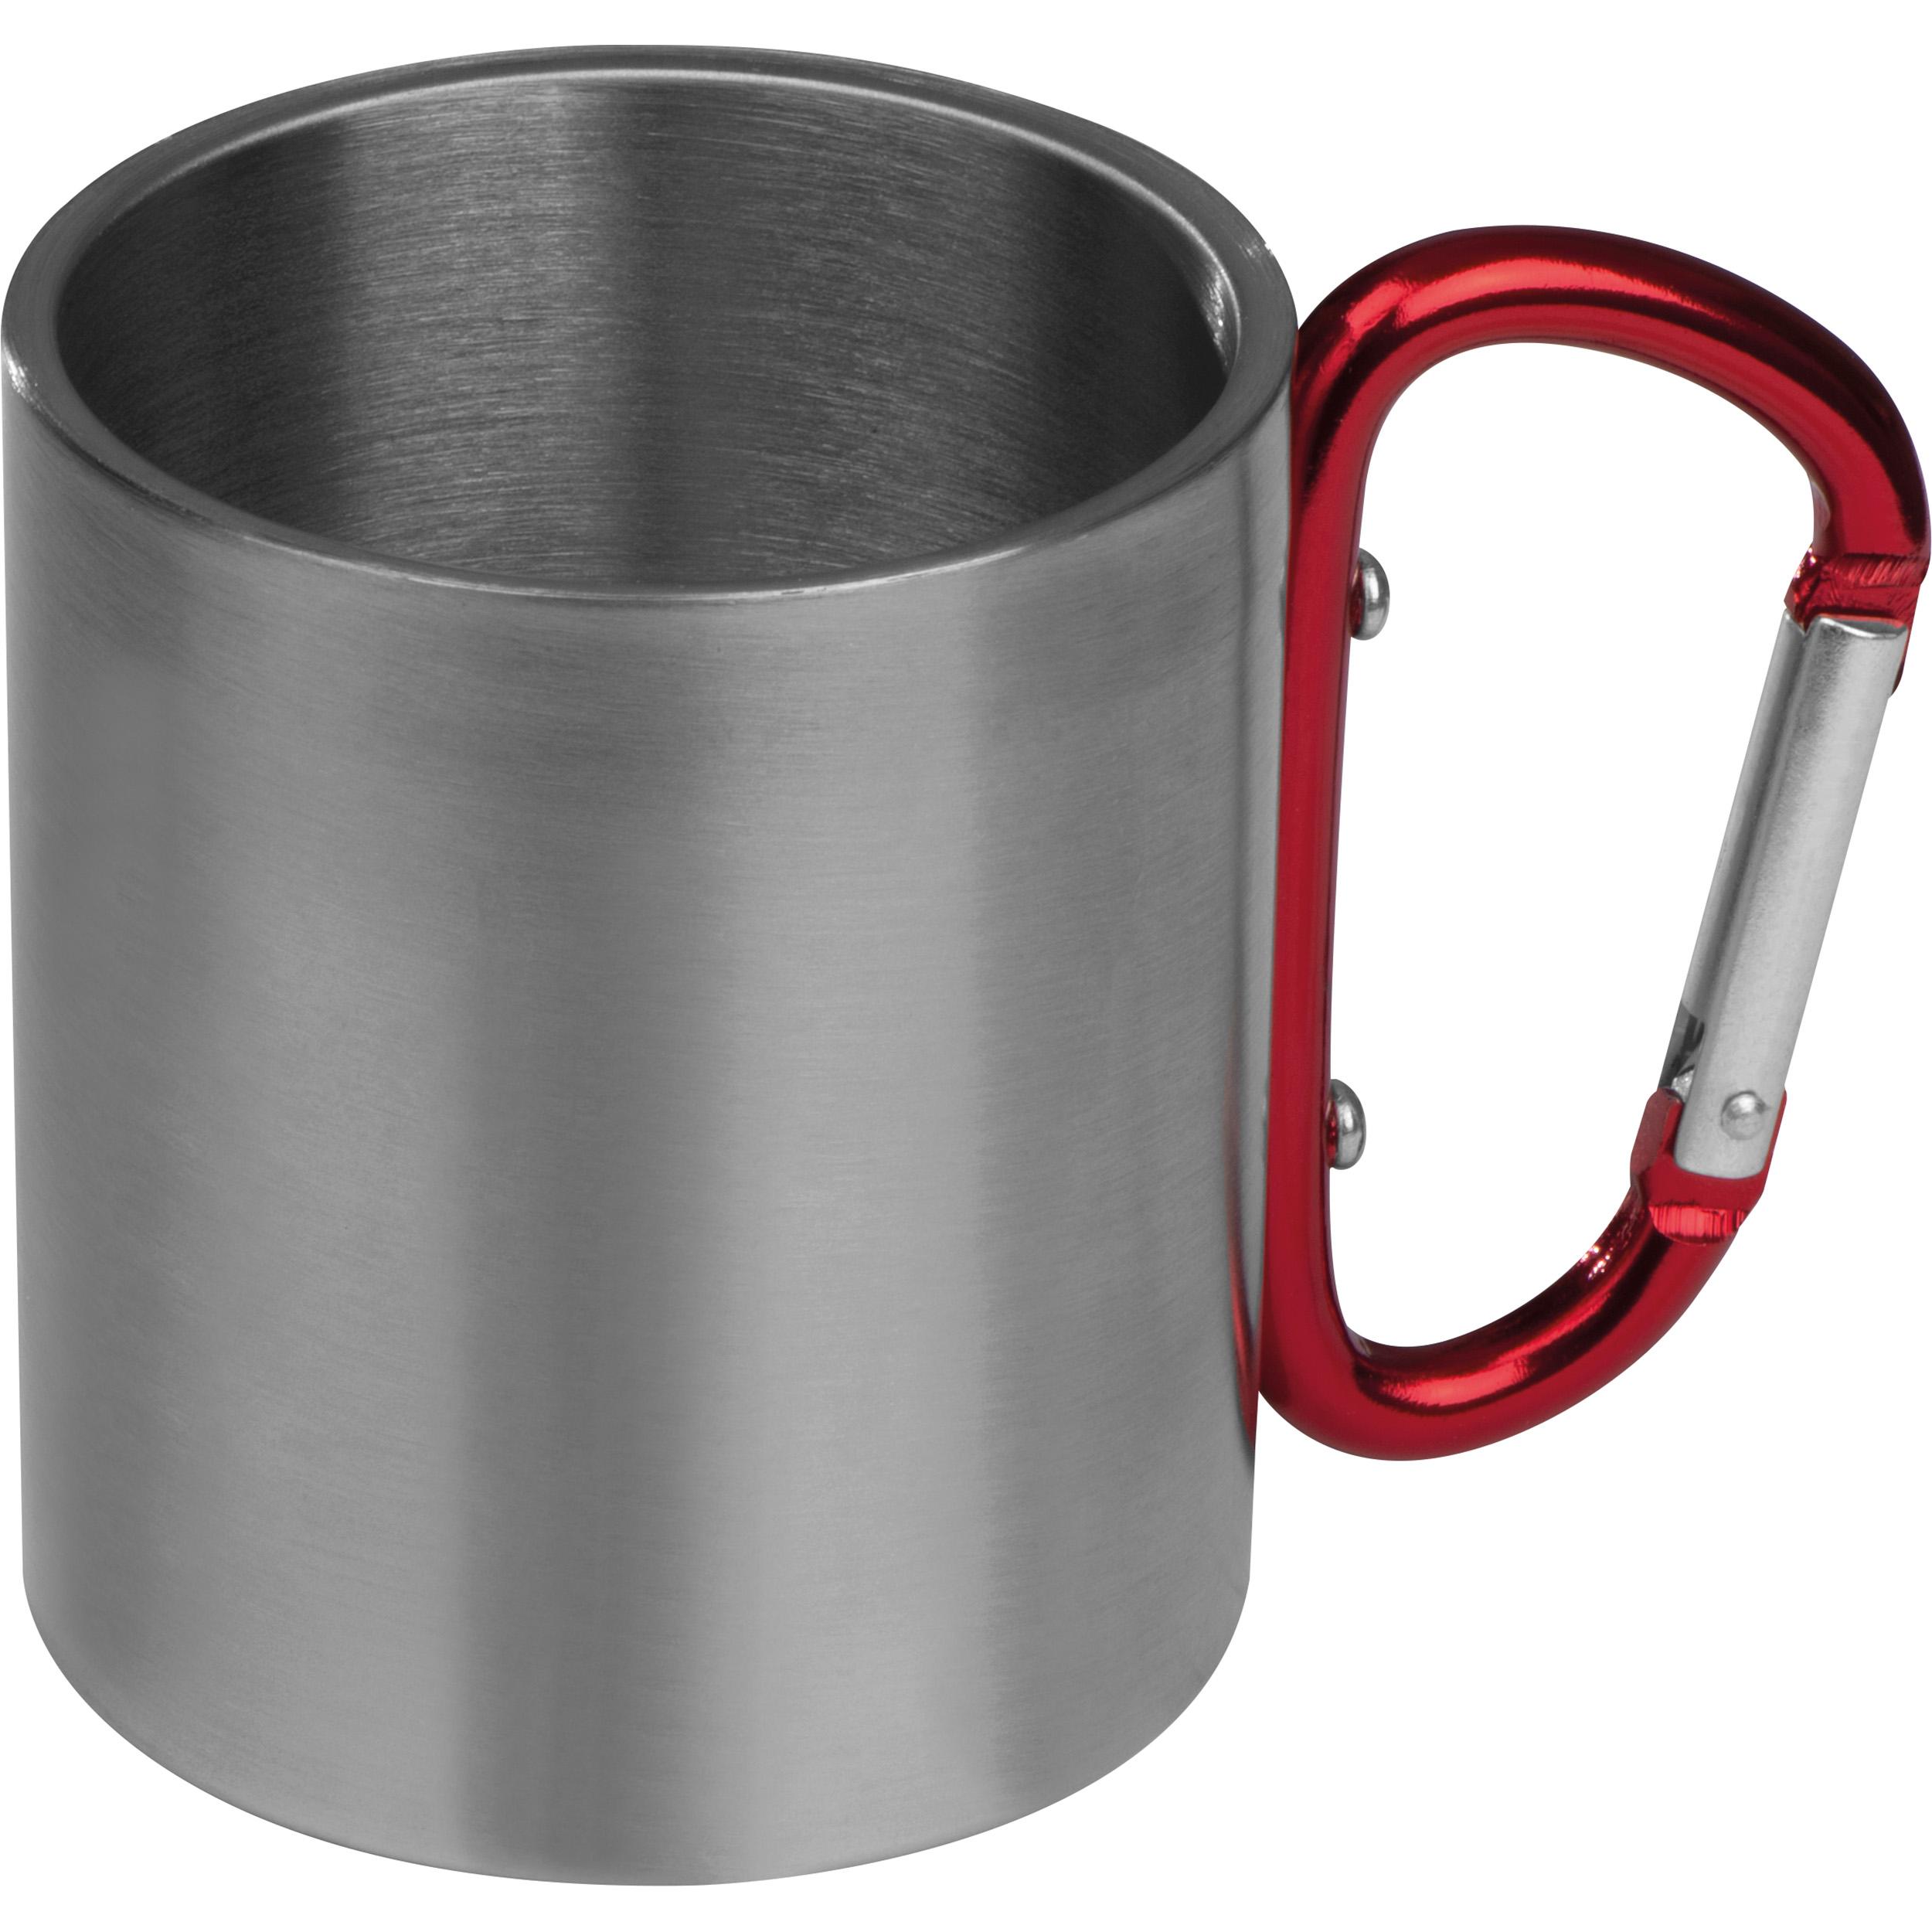 Metal mug with snap hook